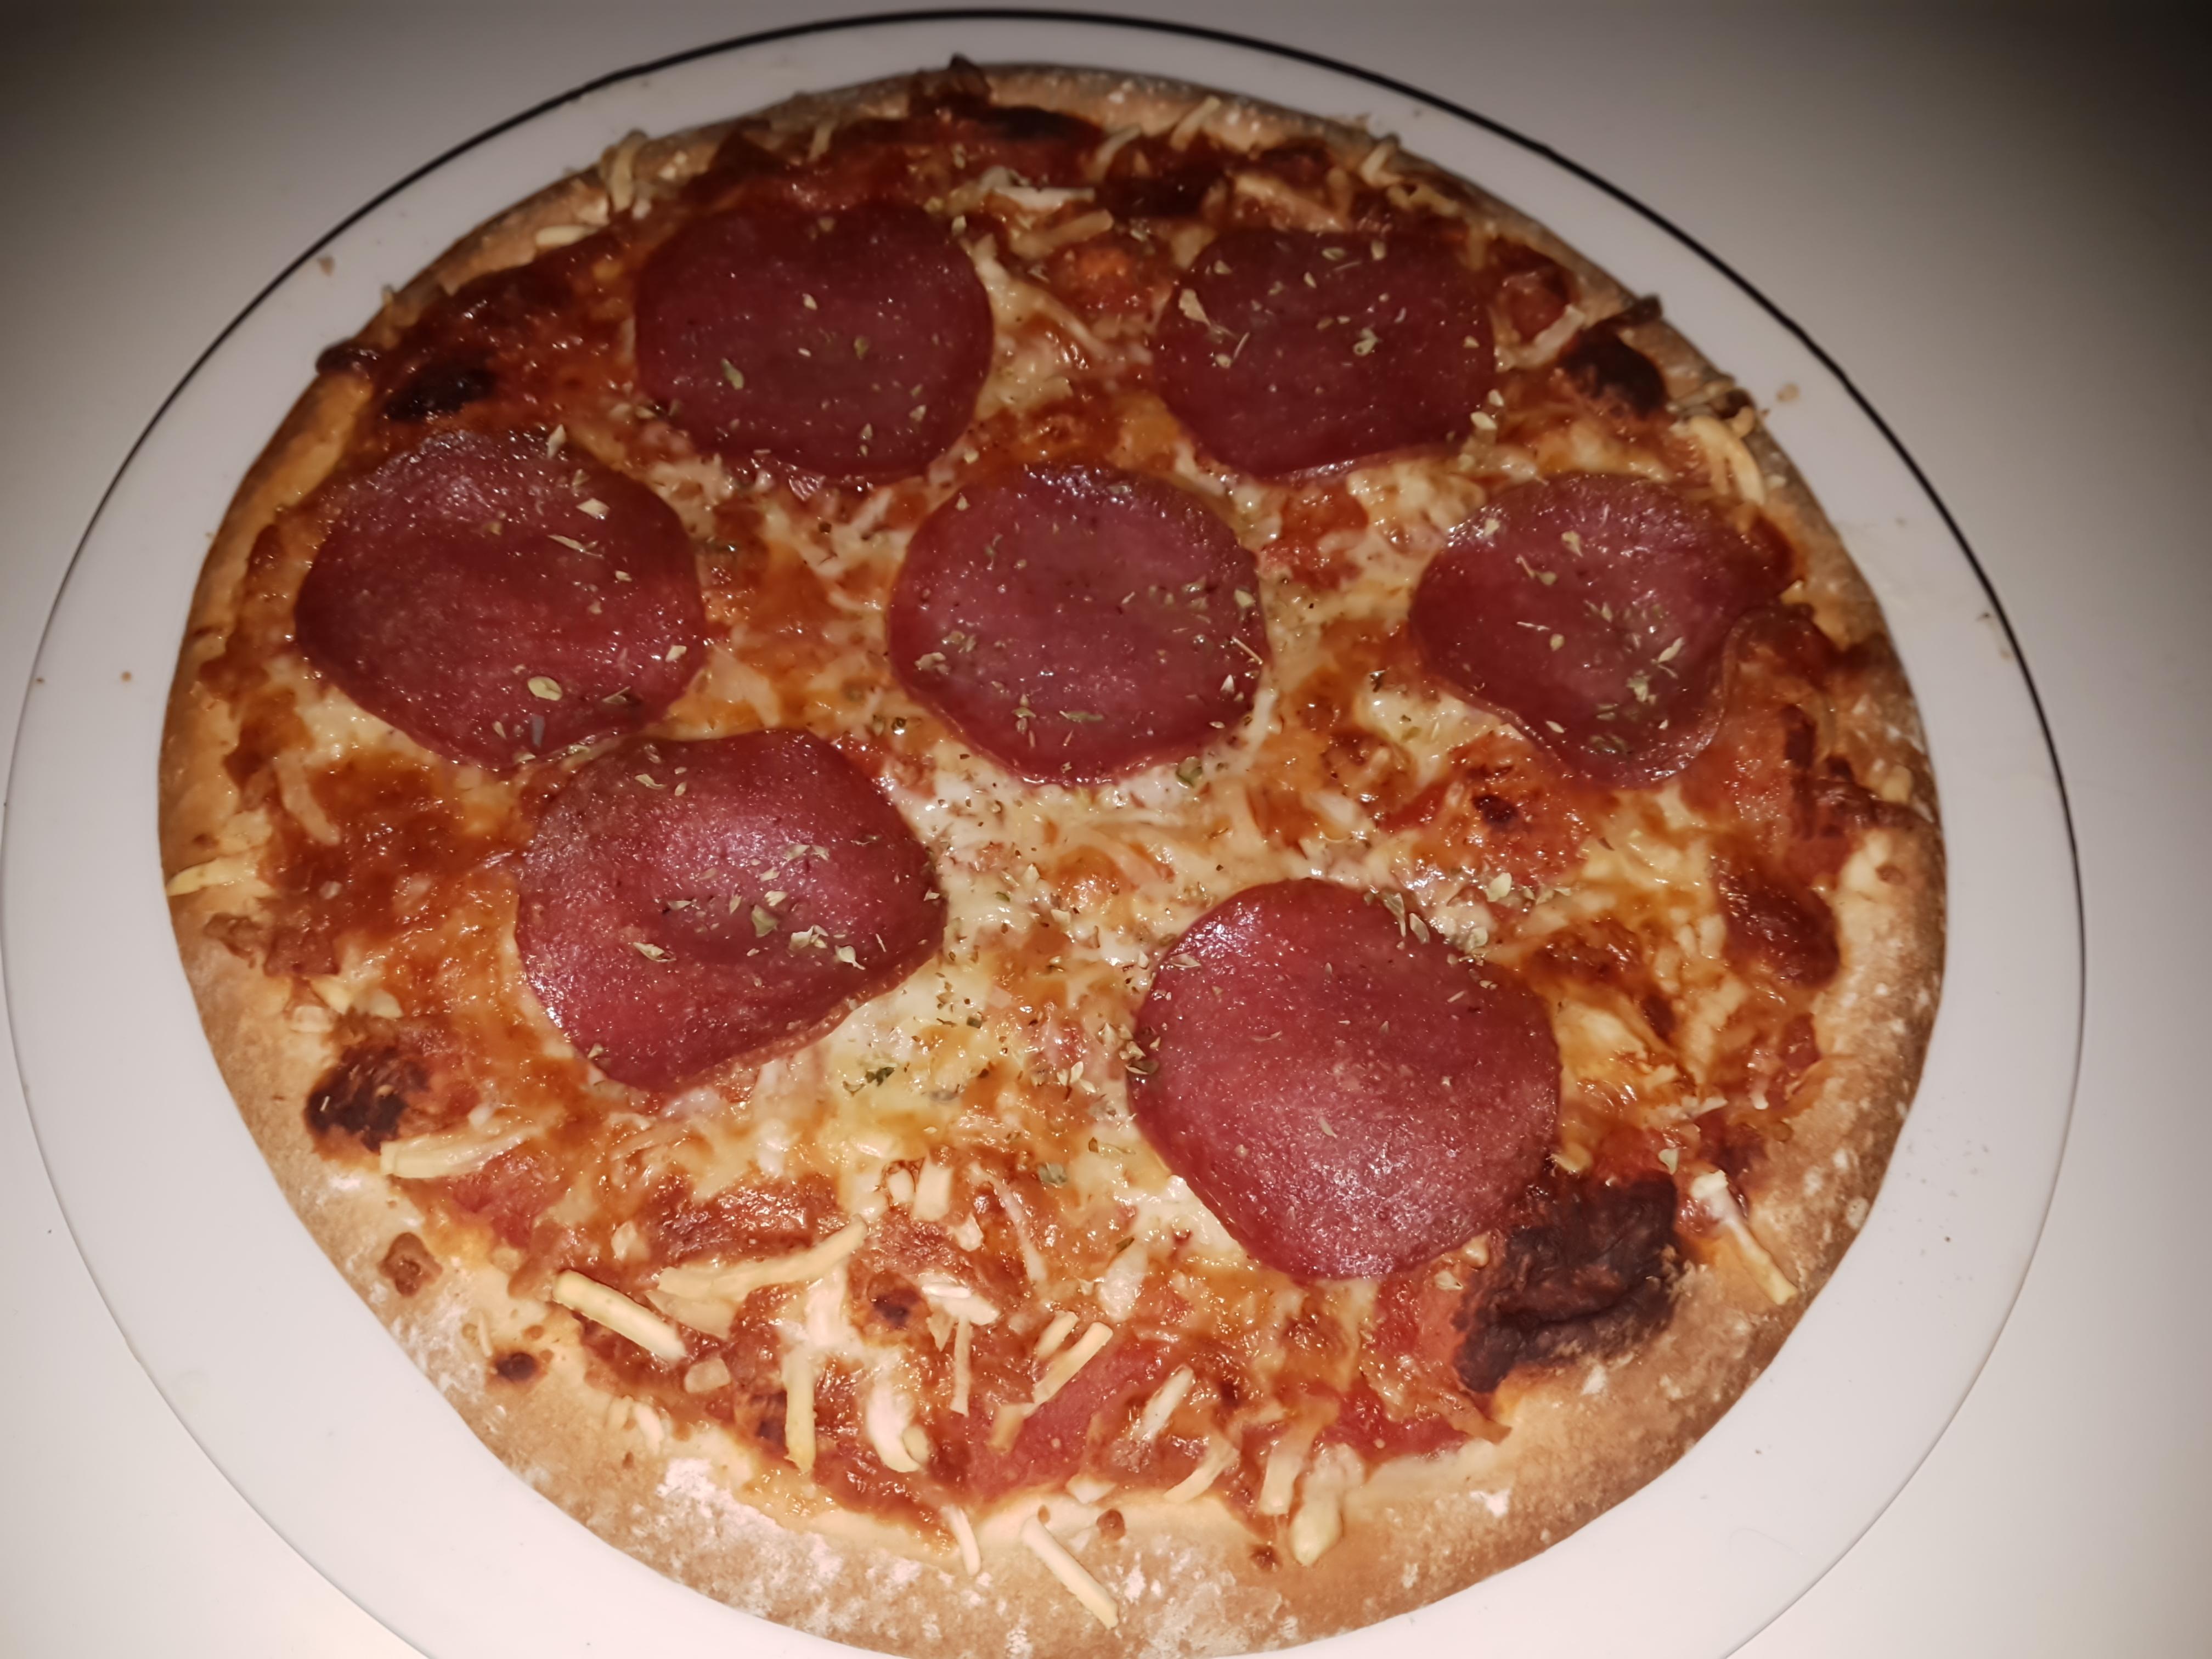 http://foodloader.net/Holz_2017-12-14_Pizza.jpg